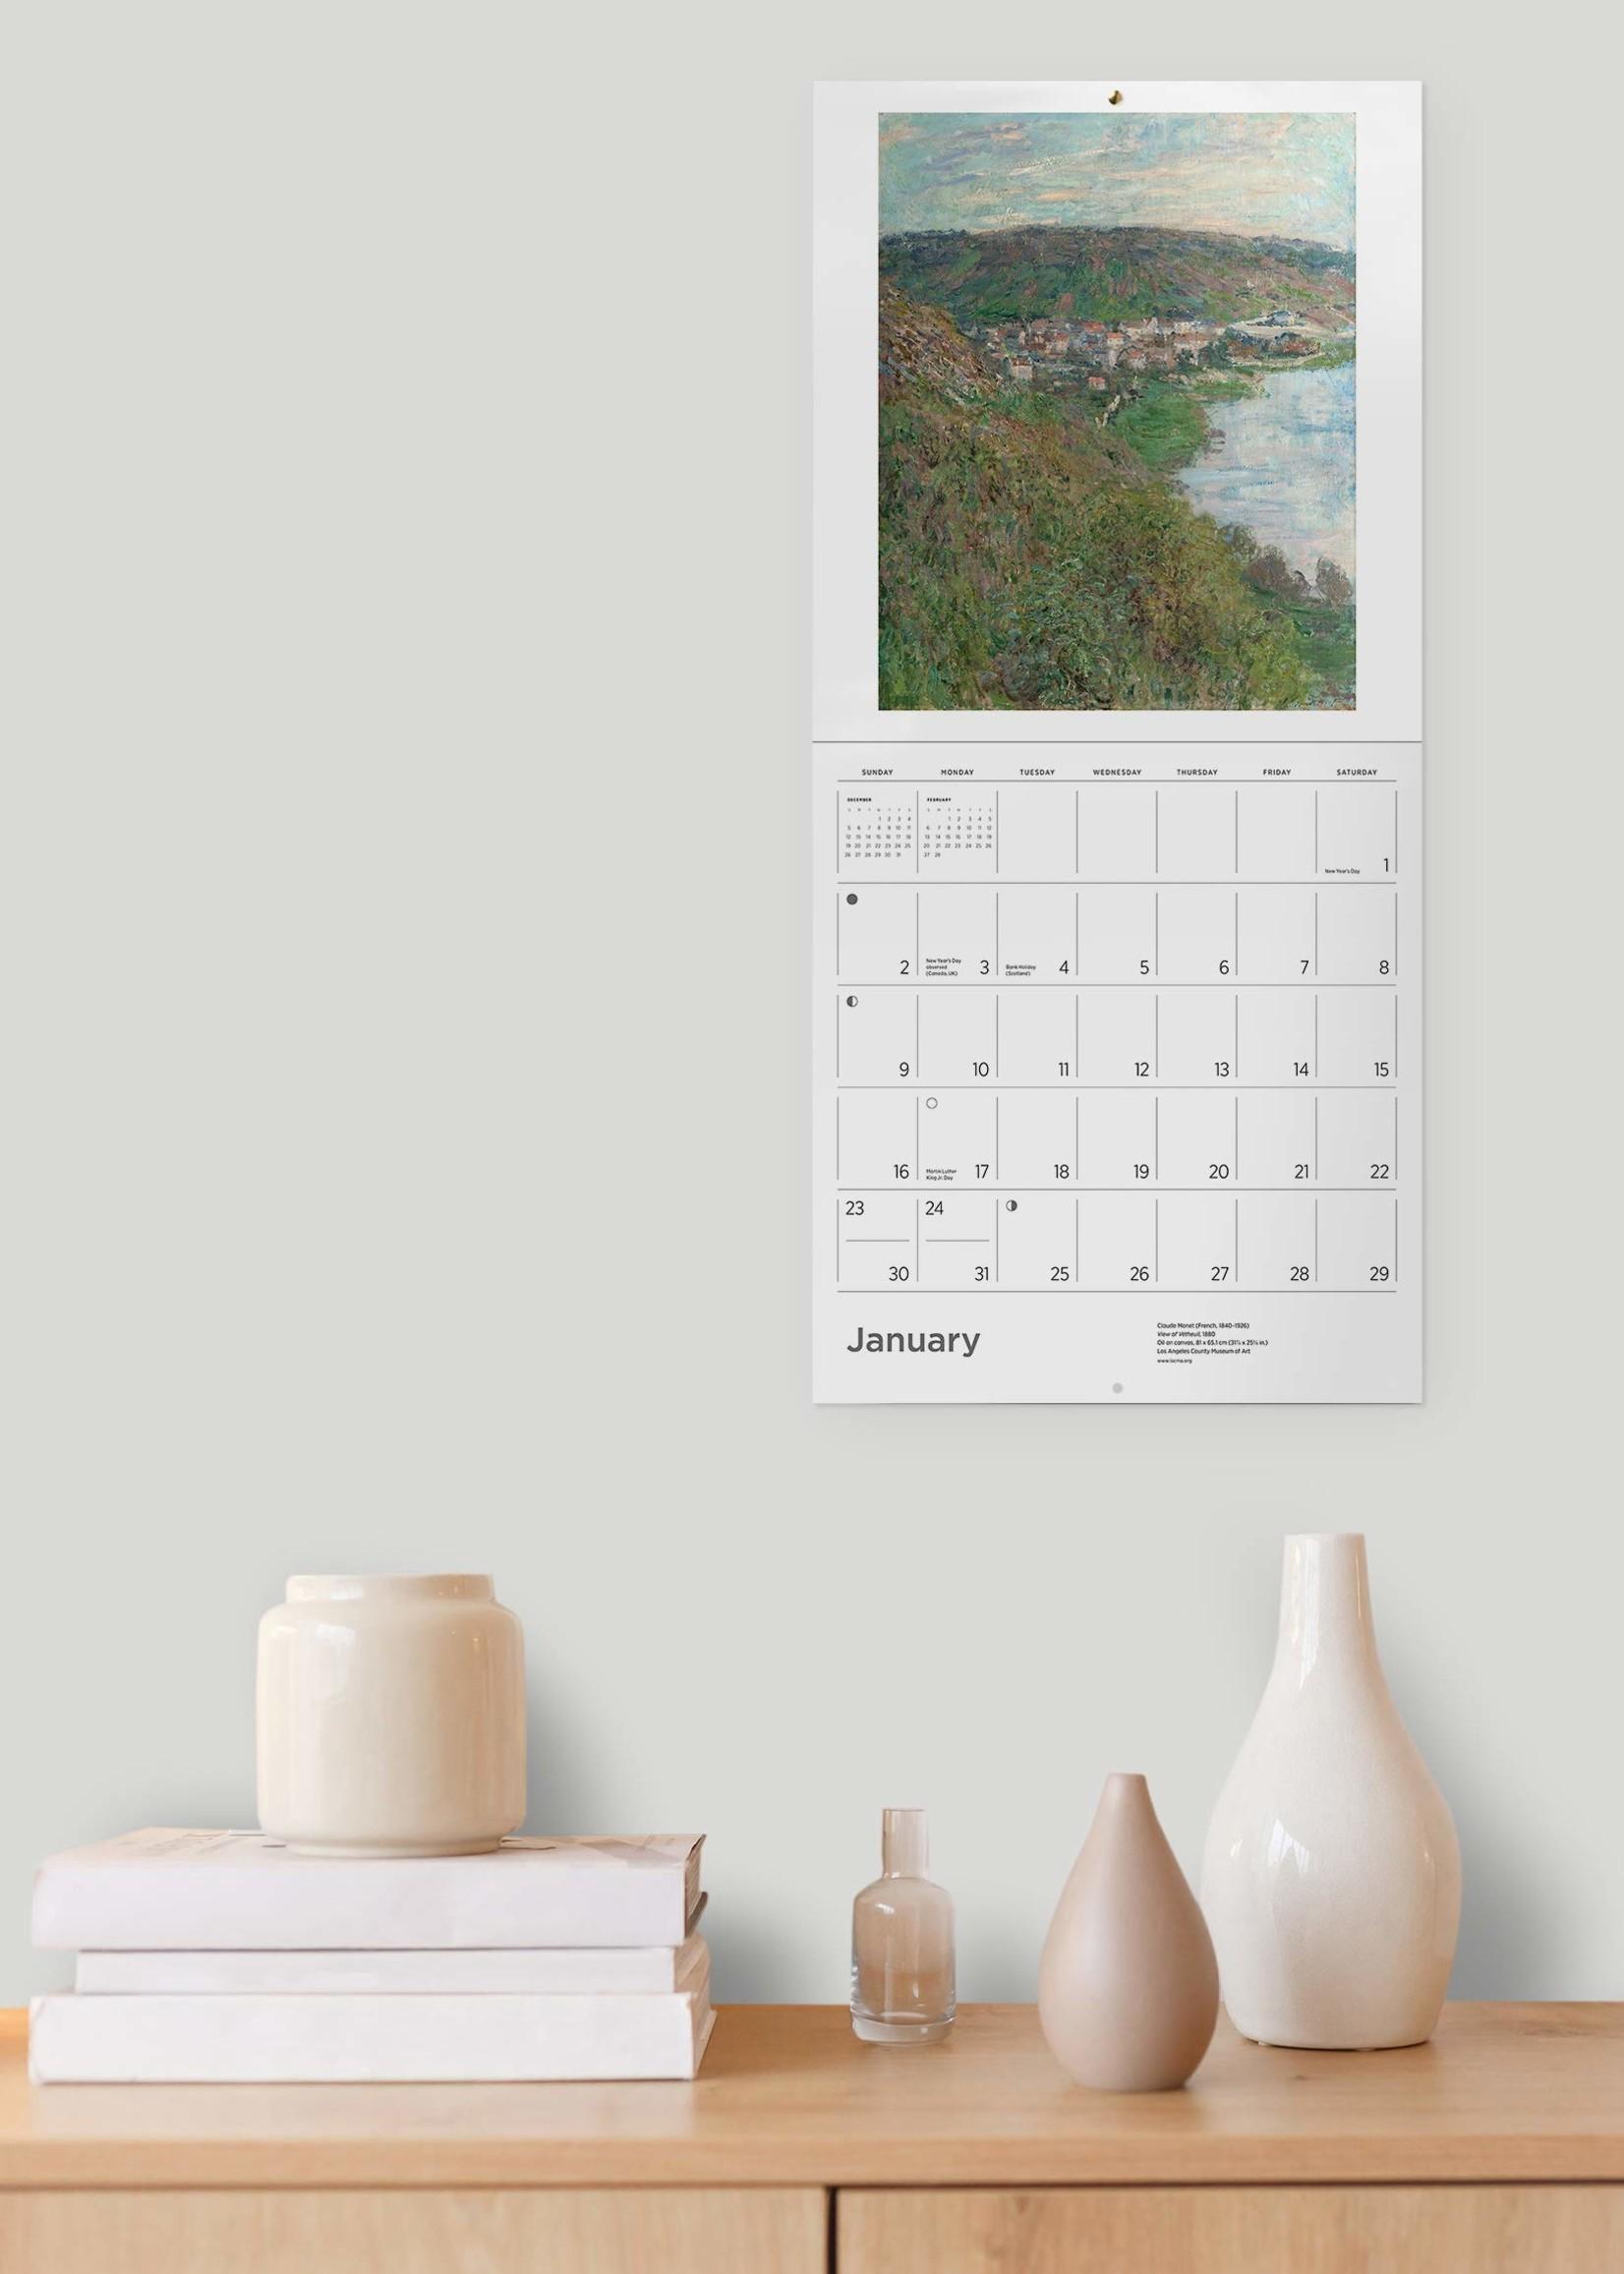 Cal 22 Claude Monet Wall